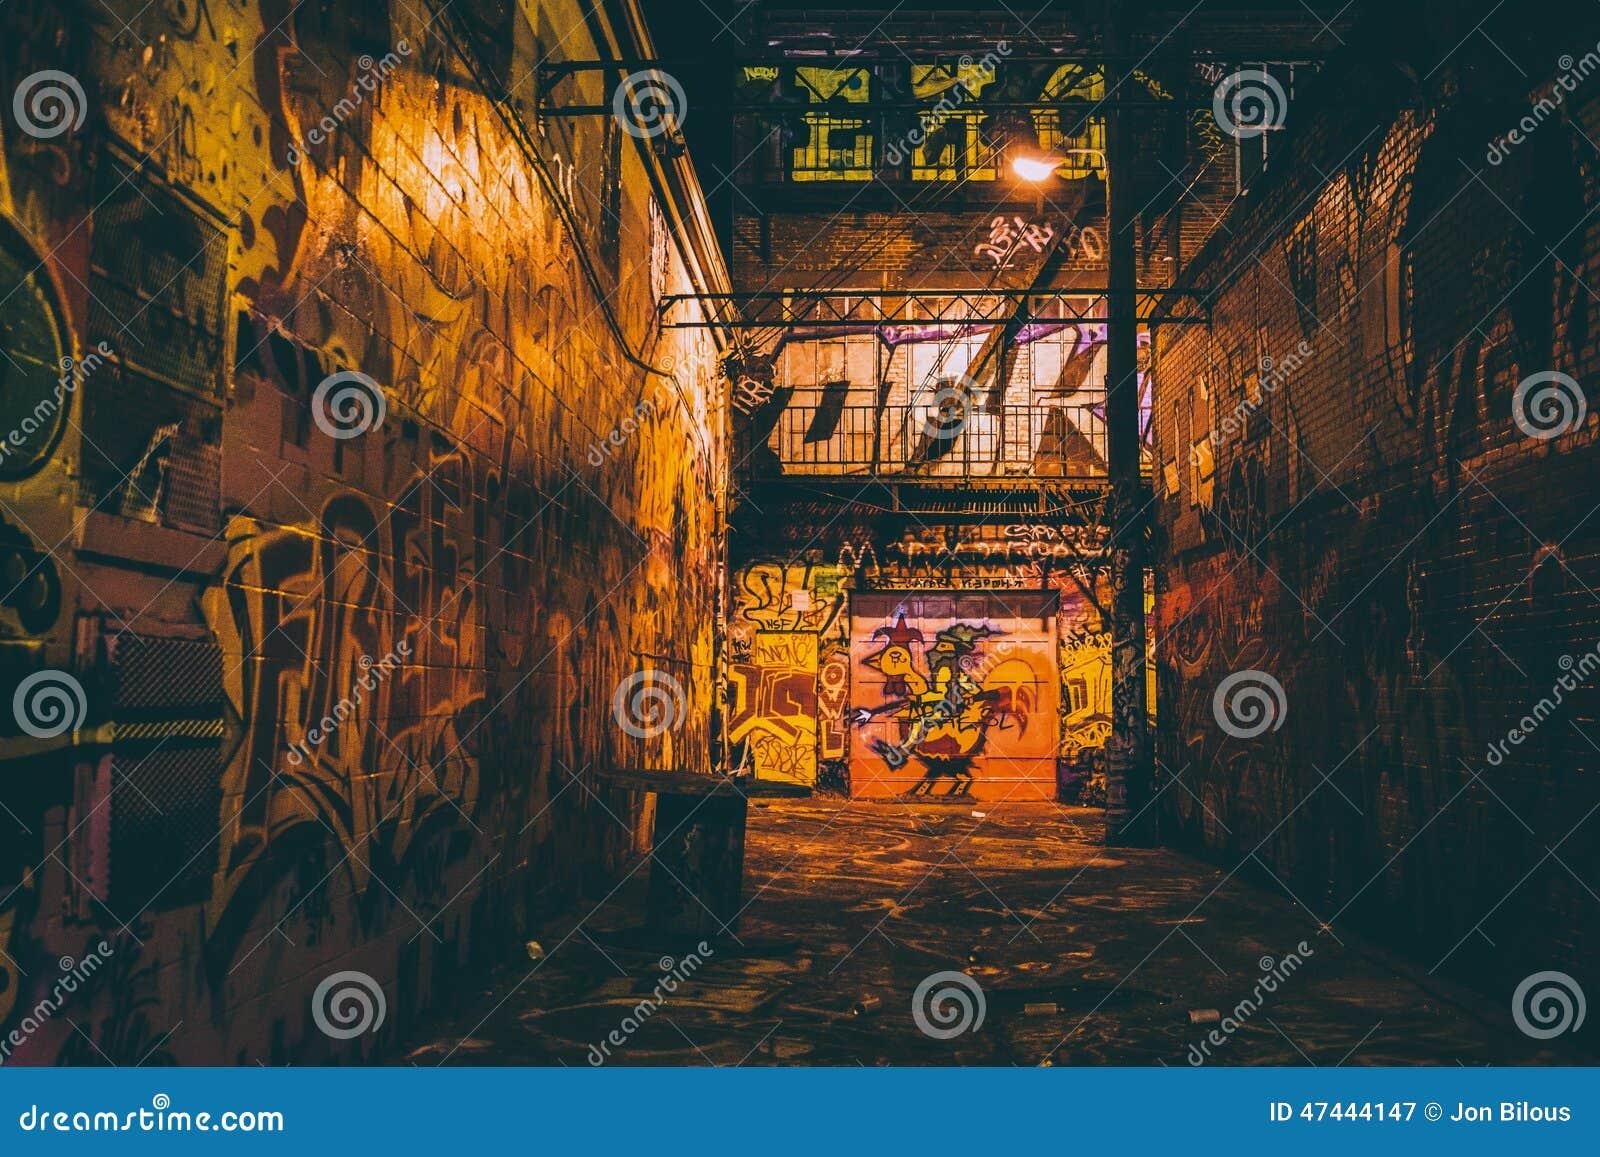 Graffiti wall baltimore - Graffiti Alley At Night In Baltimore Maryland Royalty Free Stock Photography